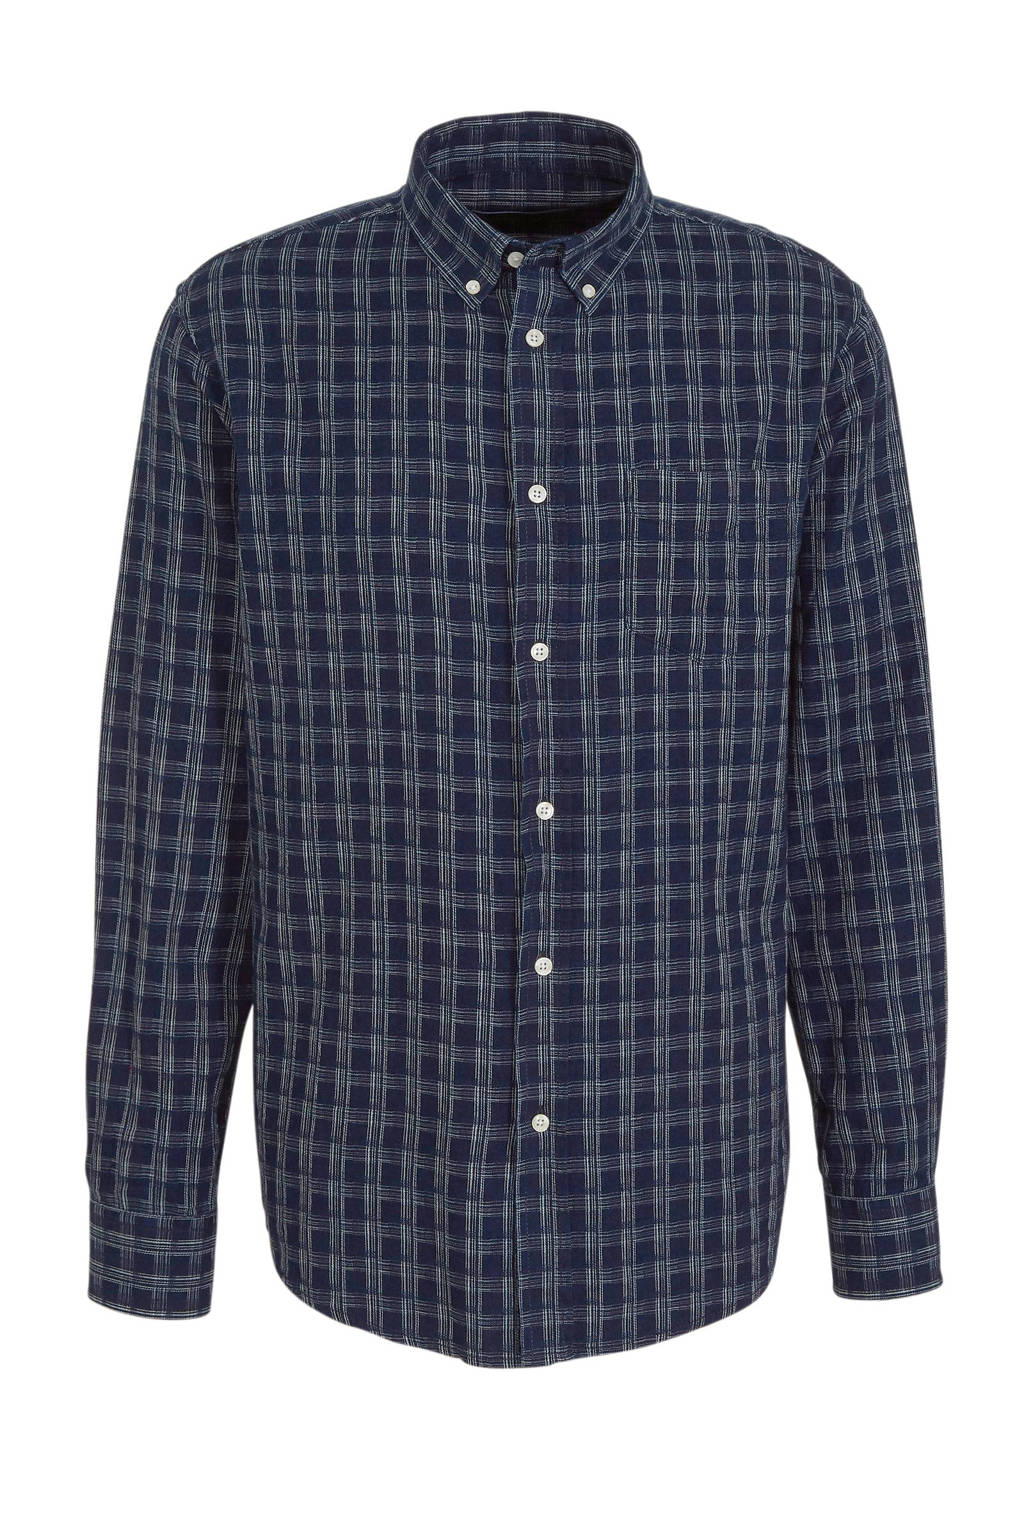 SUIT geruit regular fit overhemd donkerblauw, Donkerblauw